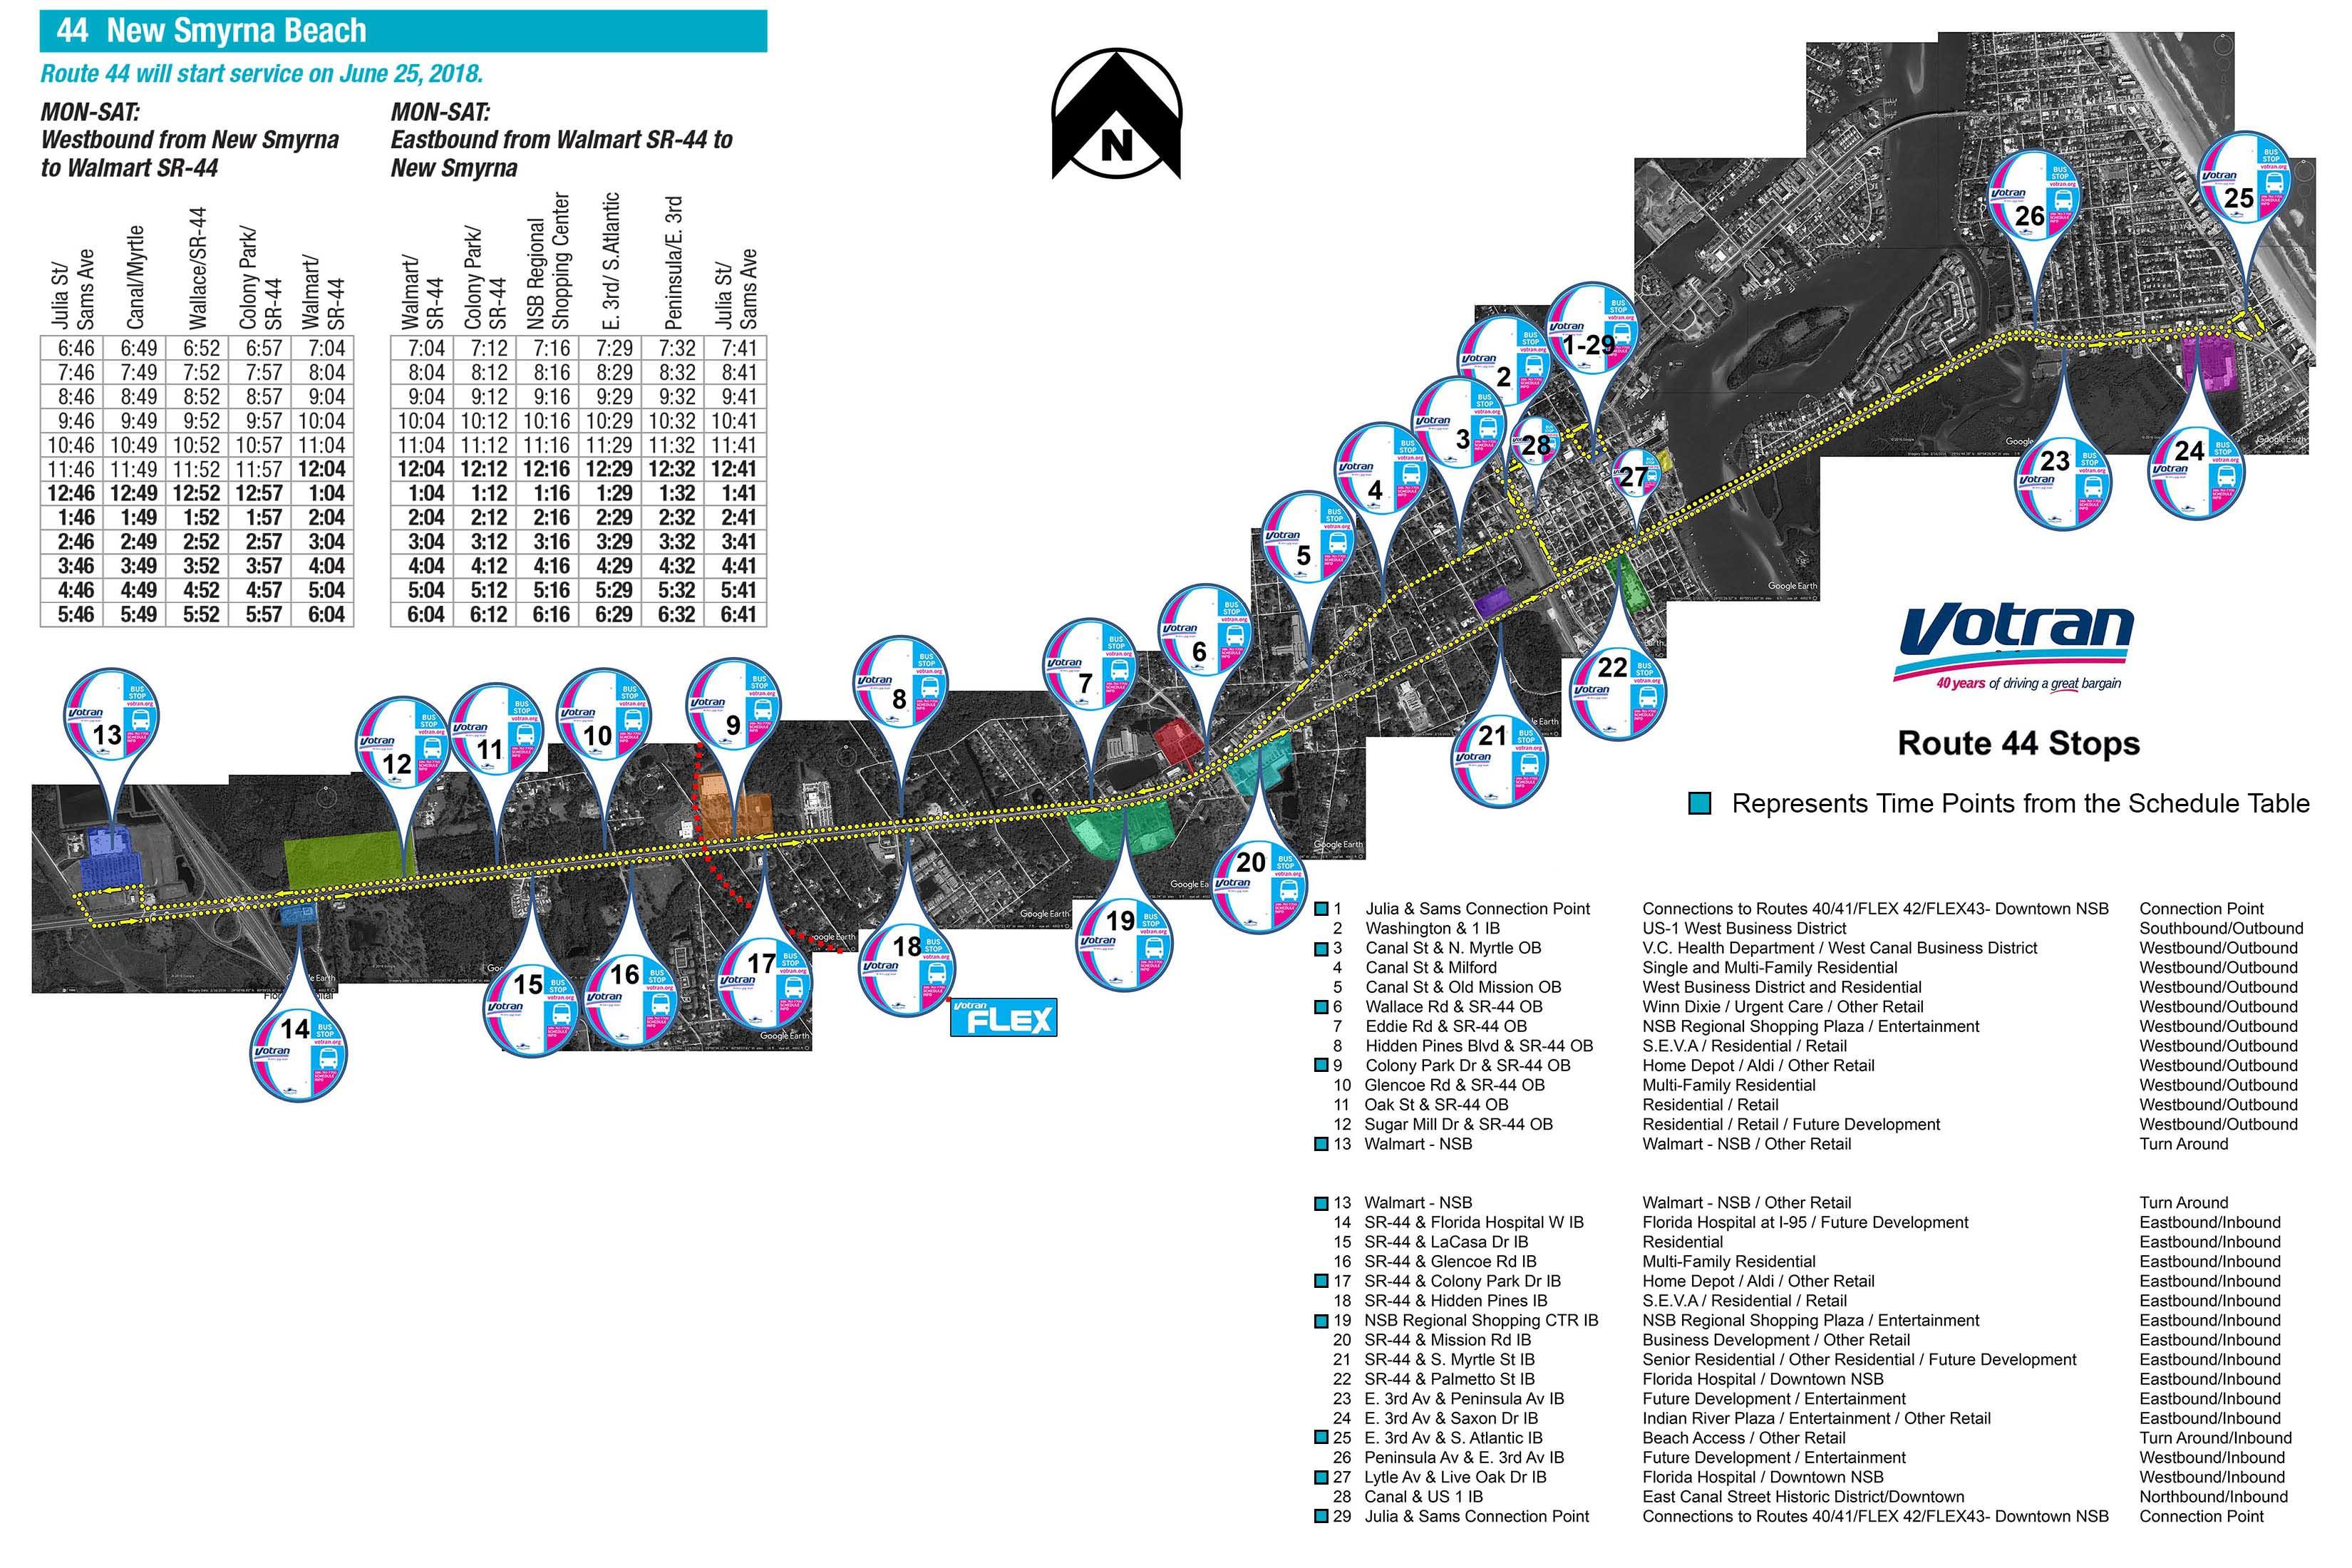 Route Details on route 22 map, route 17 map, route 33 map, route 2 map, route 12 map, route 5 map, route 18 map, route 101 map, route 6 map, route 1 map, route 23 map, route 70 map, route 30 map, route 91 map, route 53 map, route 20 map, route 202 map, route 50 map, route 60 map, route 90 map,